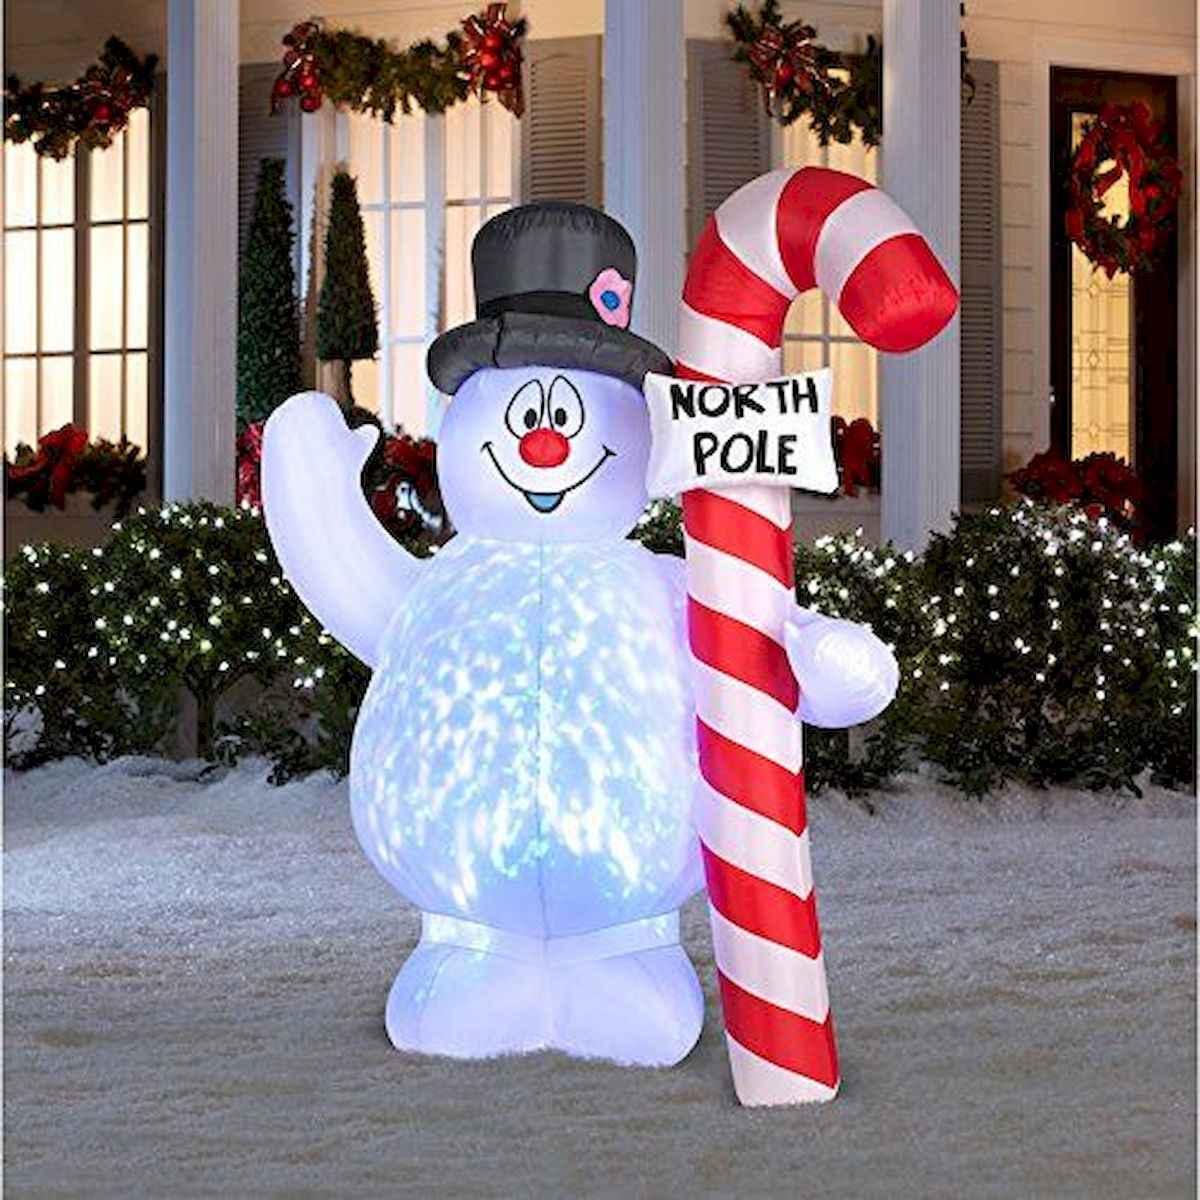 40 amazing outdoor christmas decorations ideas (7)